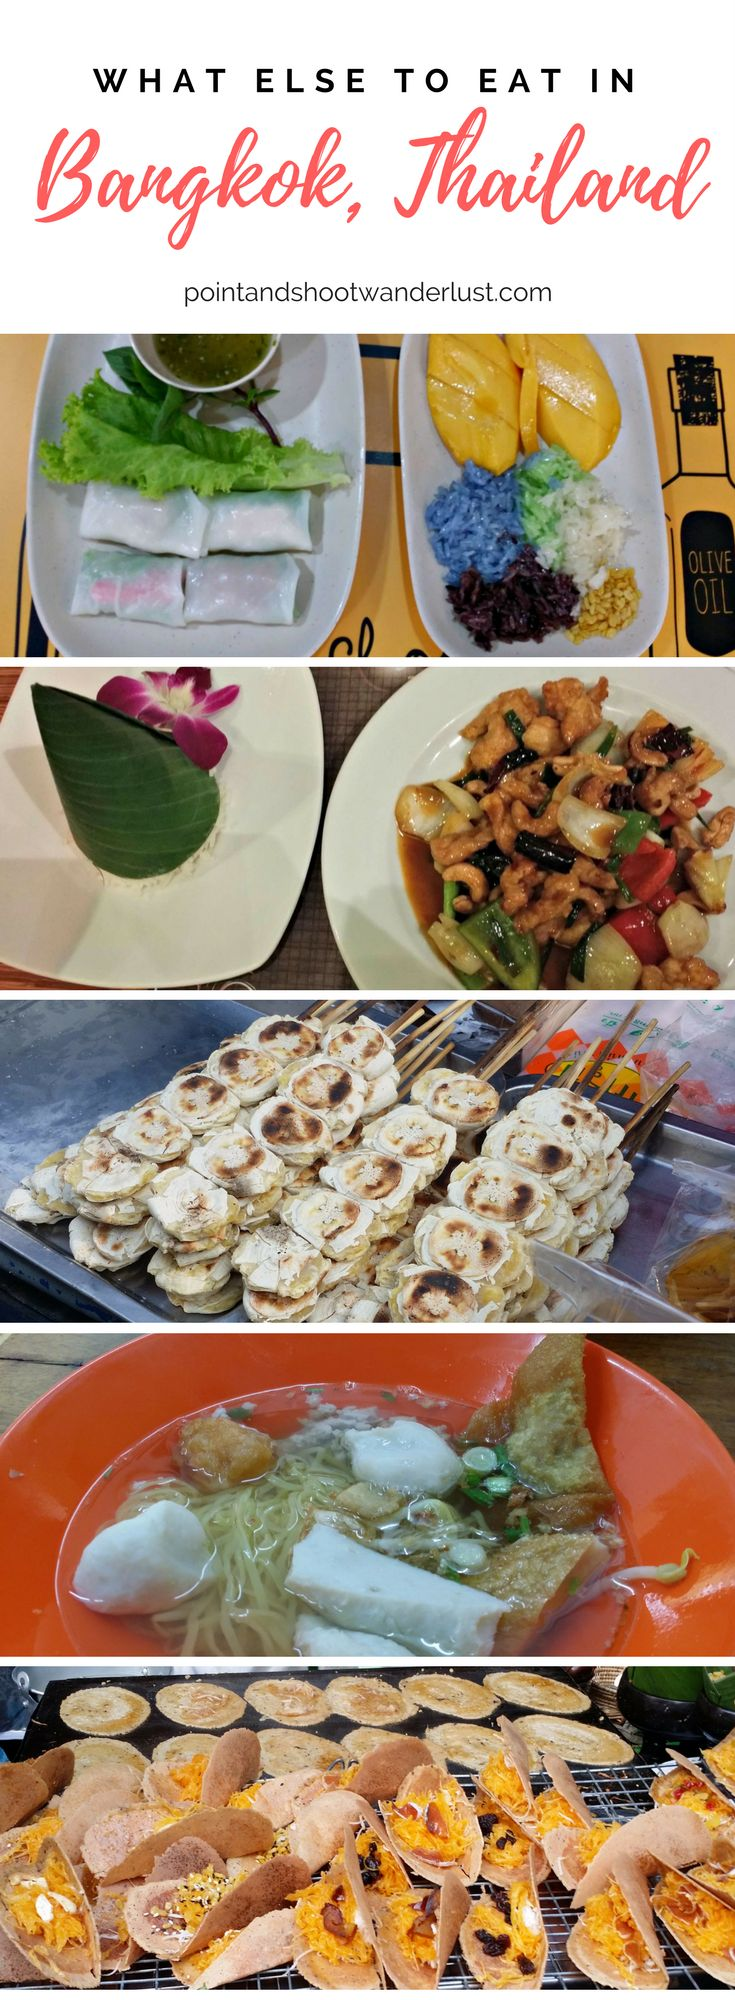 Bangkok, Thailand | Thai food | What to eat in Thailand | Where to eat in Bangkok | Foodscapades | Bangkok food | Mango Sticky Rice | Thai Street food | Asian food | Southeast Asia